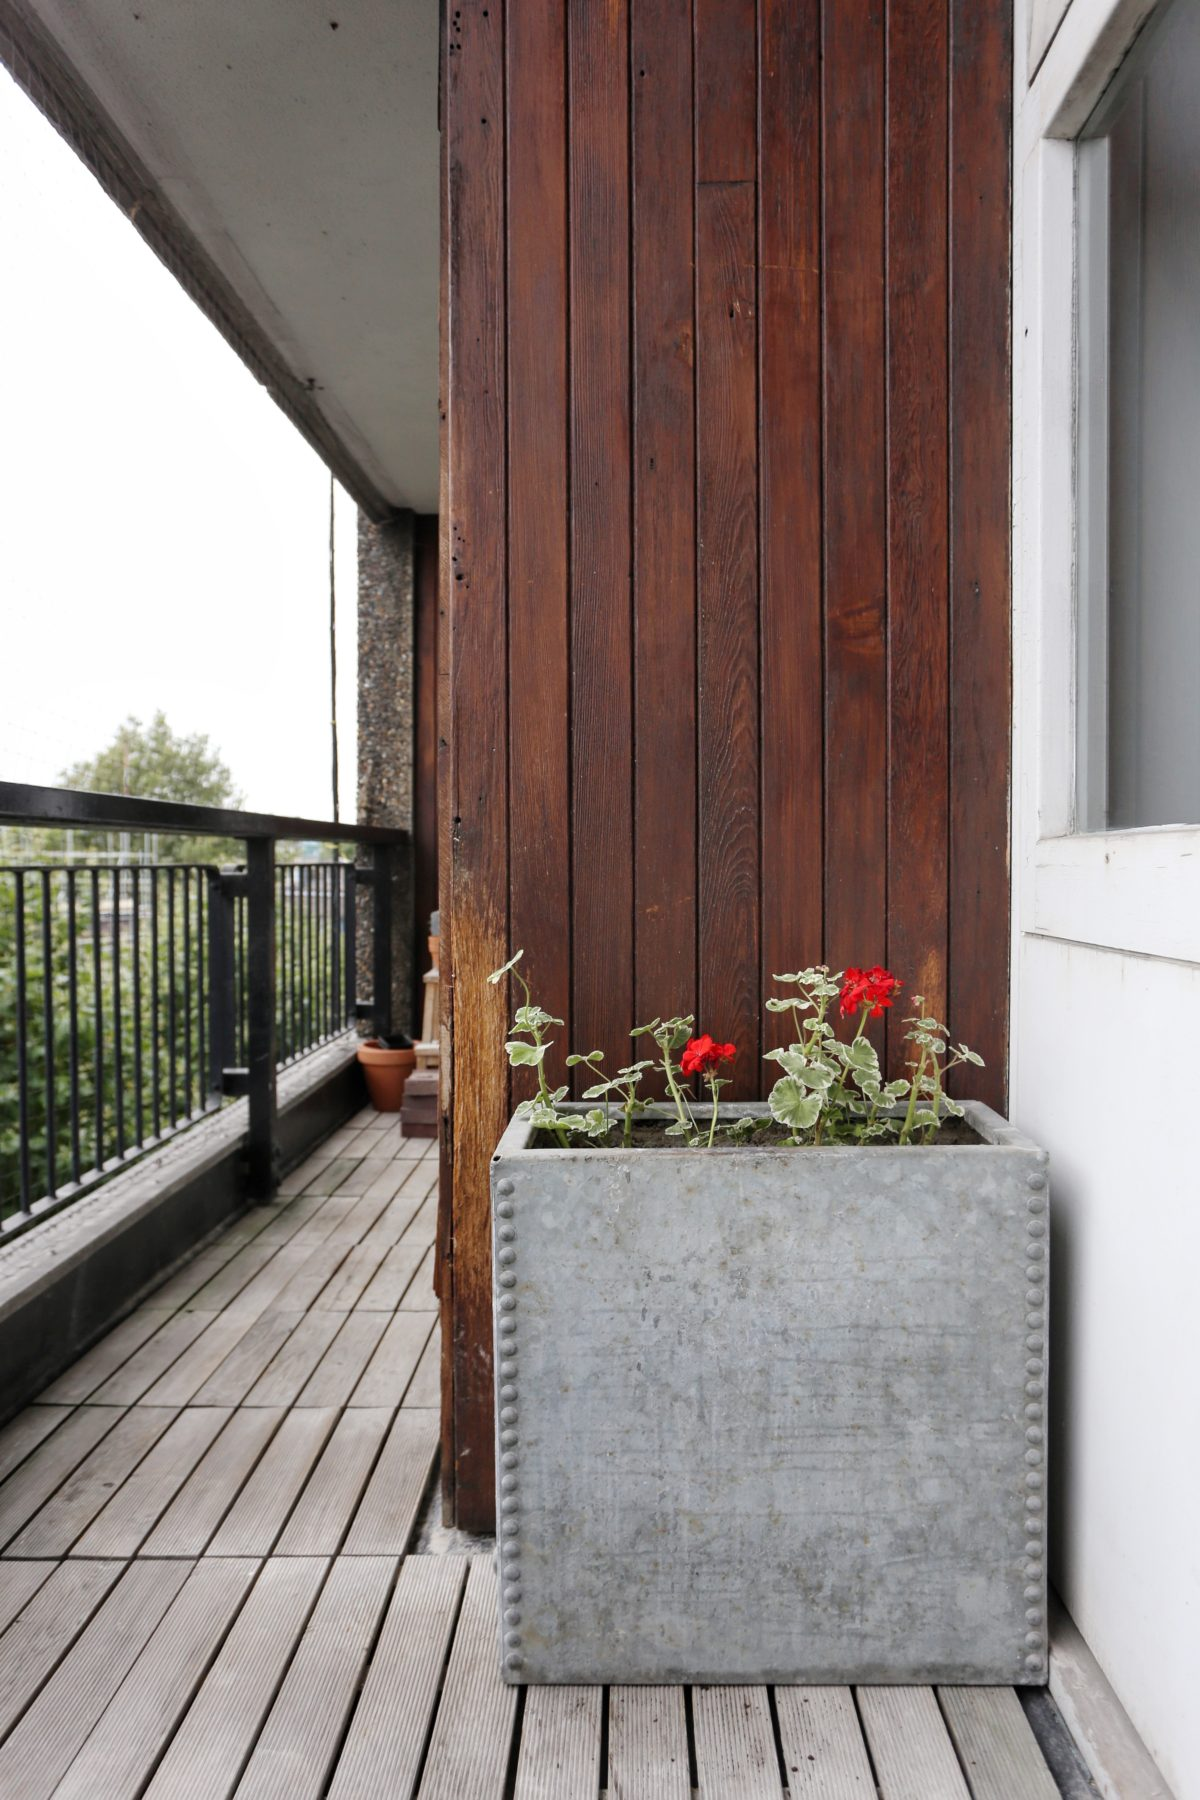 50-Trellick-Tower-22-1200x1800.jpg